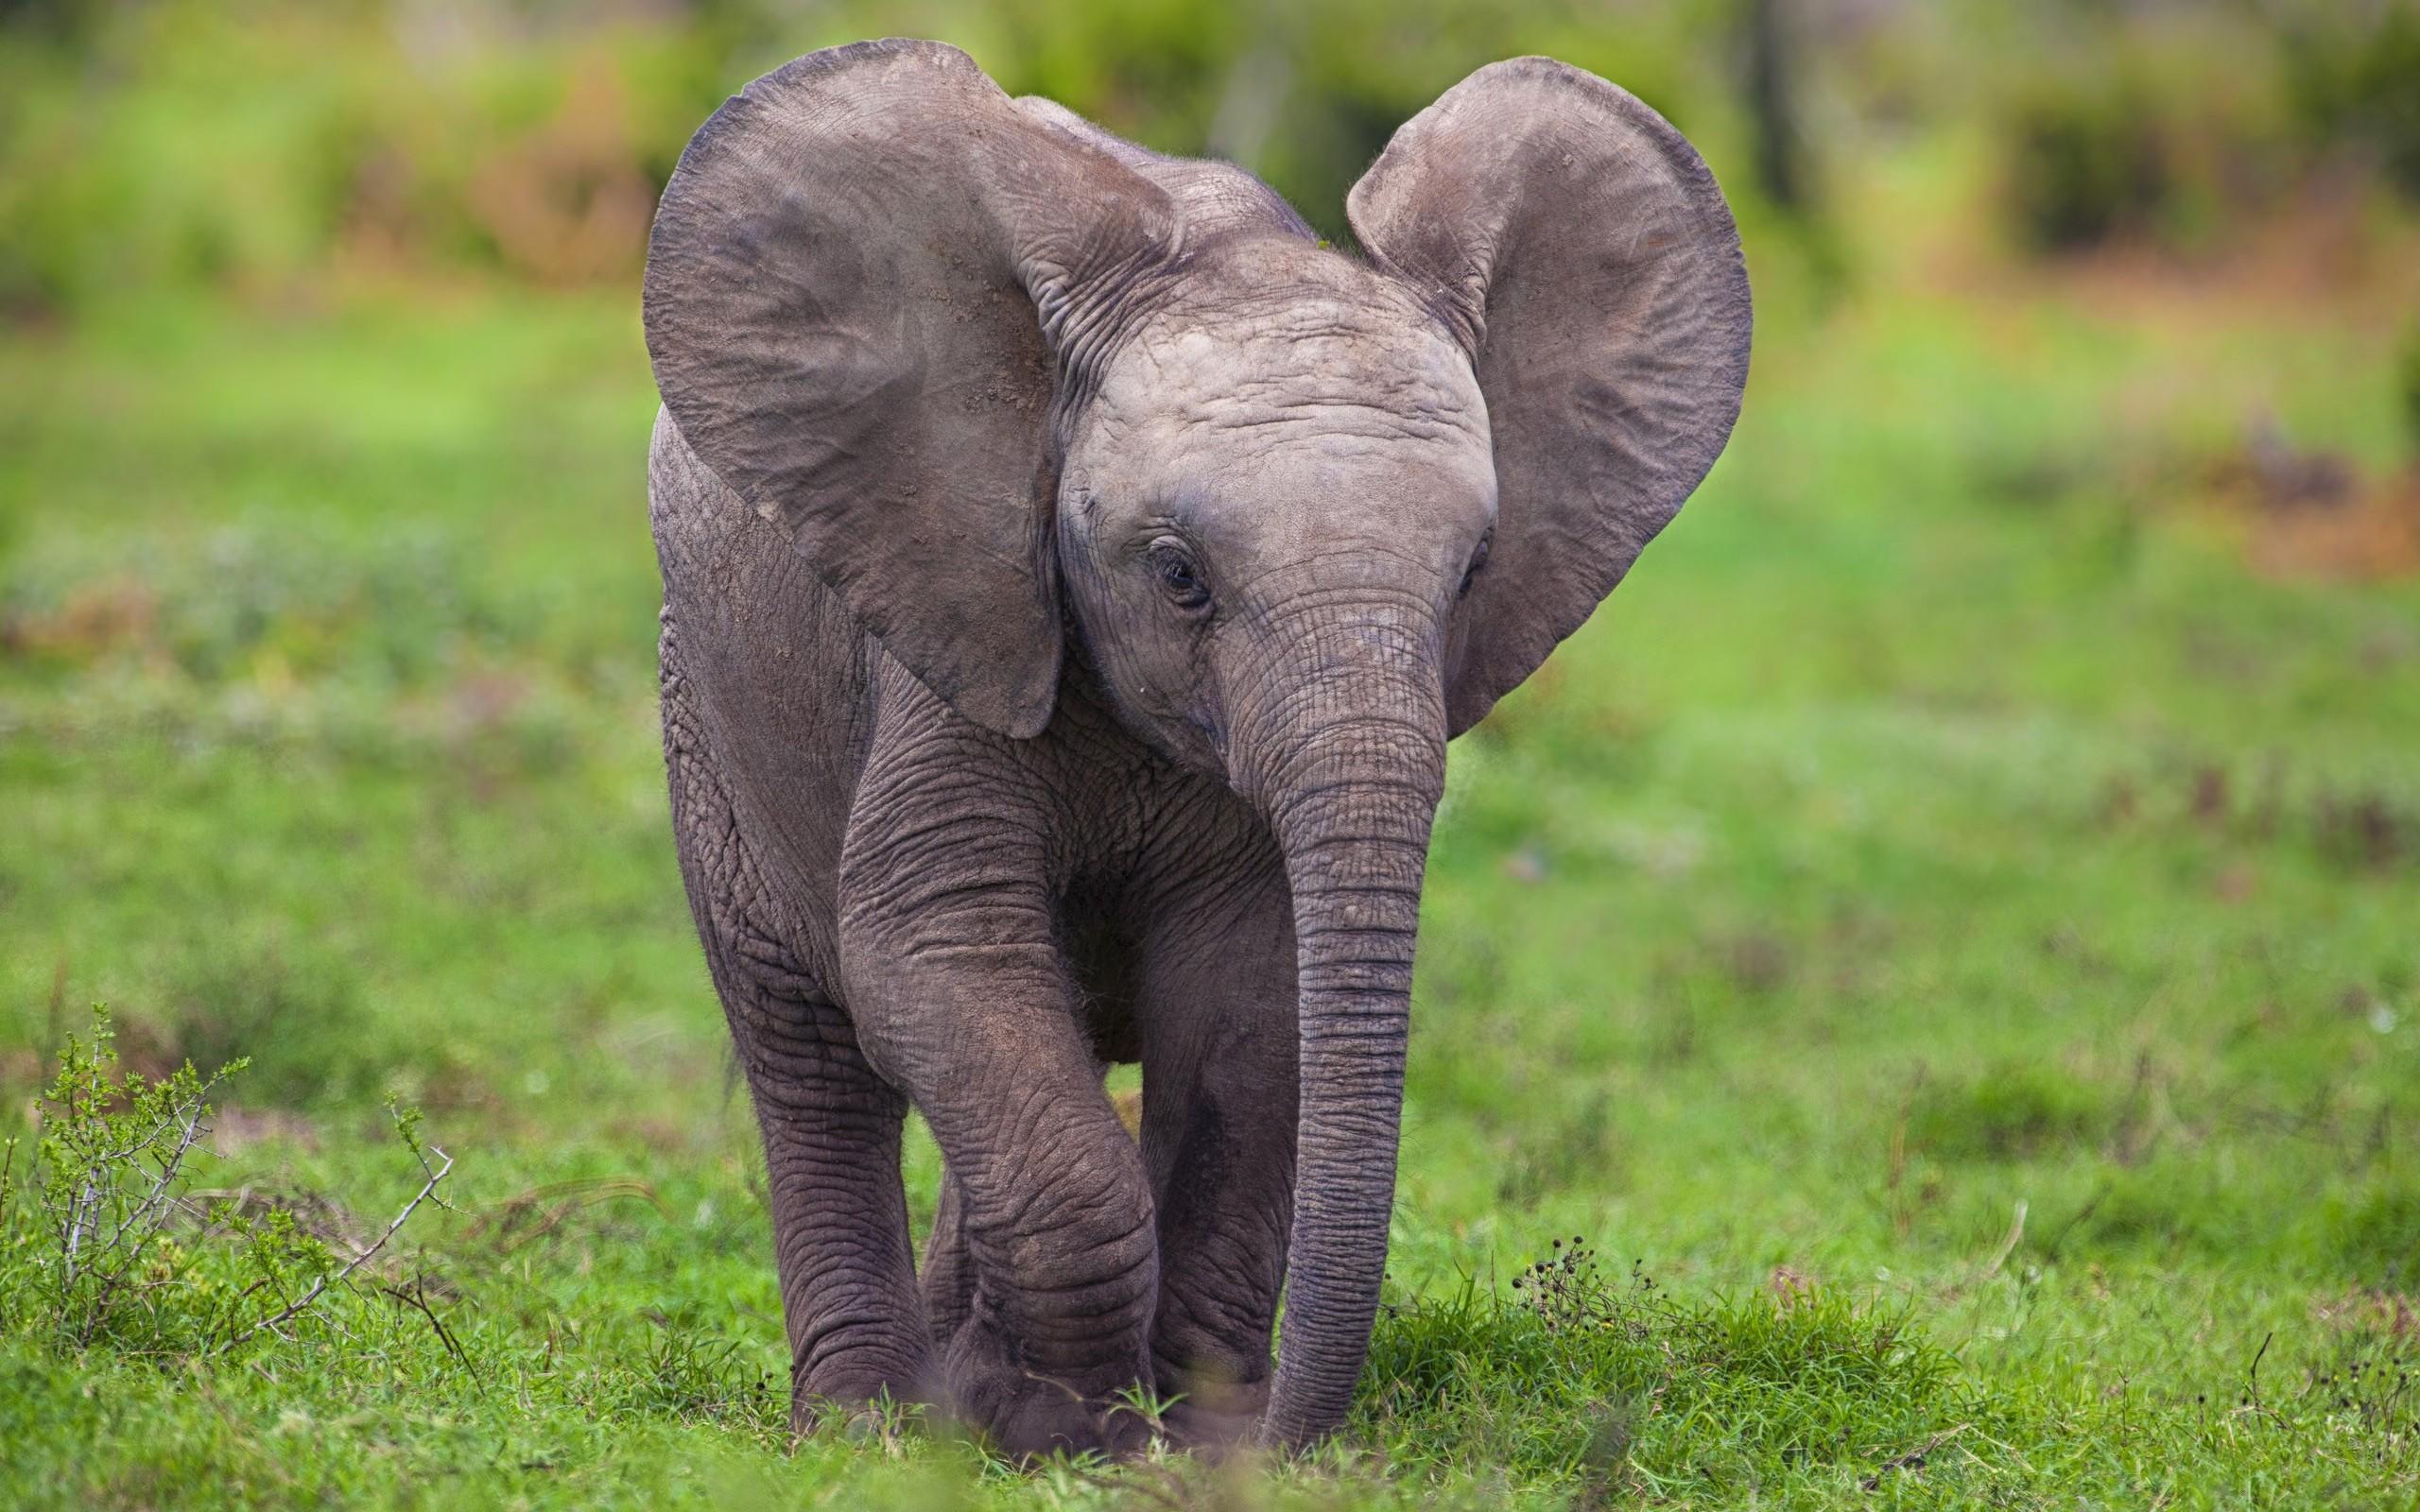 Elephant HD Wallpaper | Background Image | 2560x1600 | ID ...